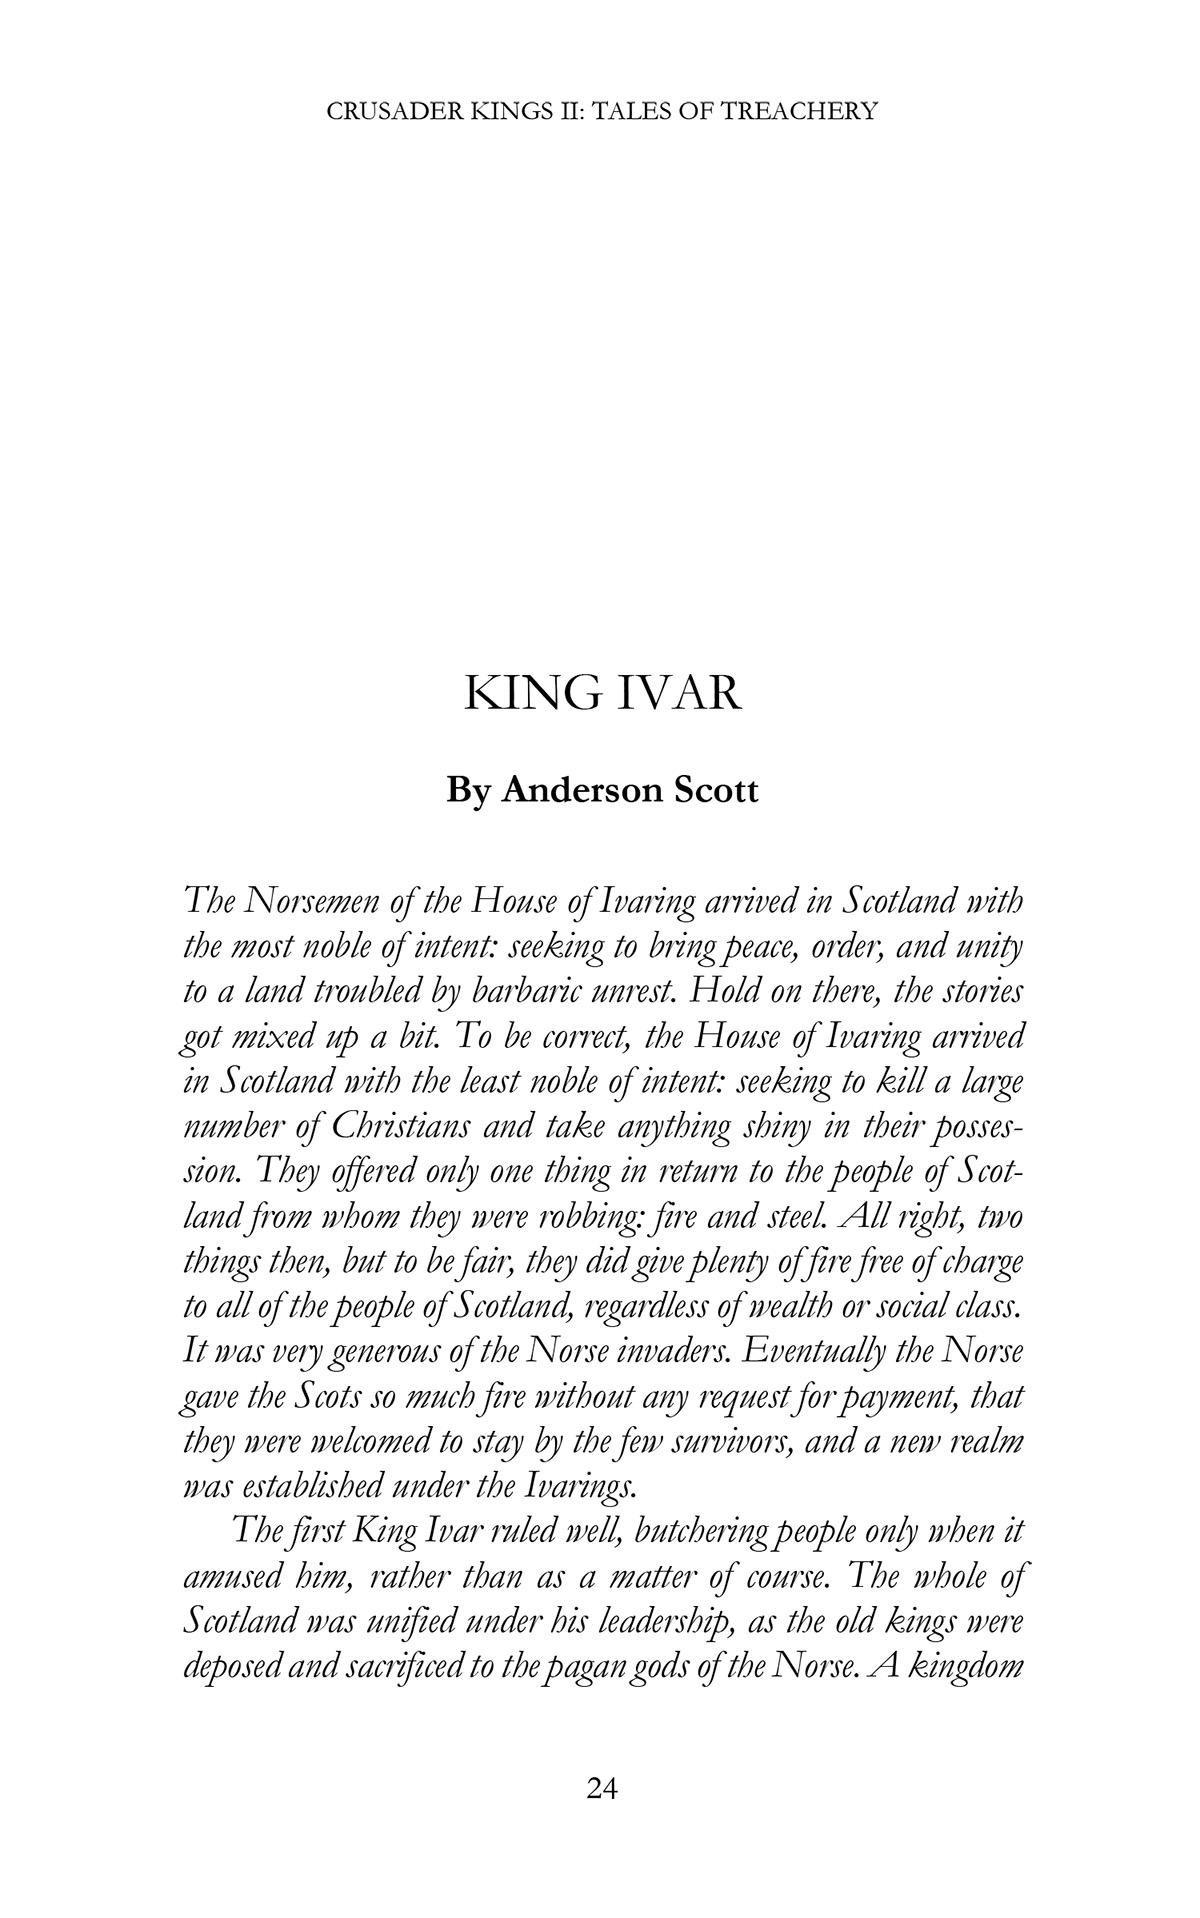 E-Book Crusader Kings II: Tales of Treachery screenshot